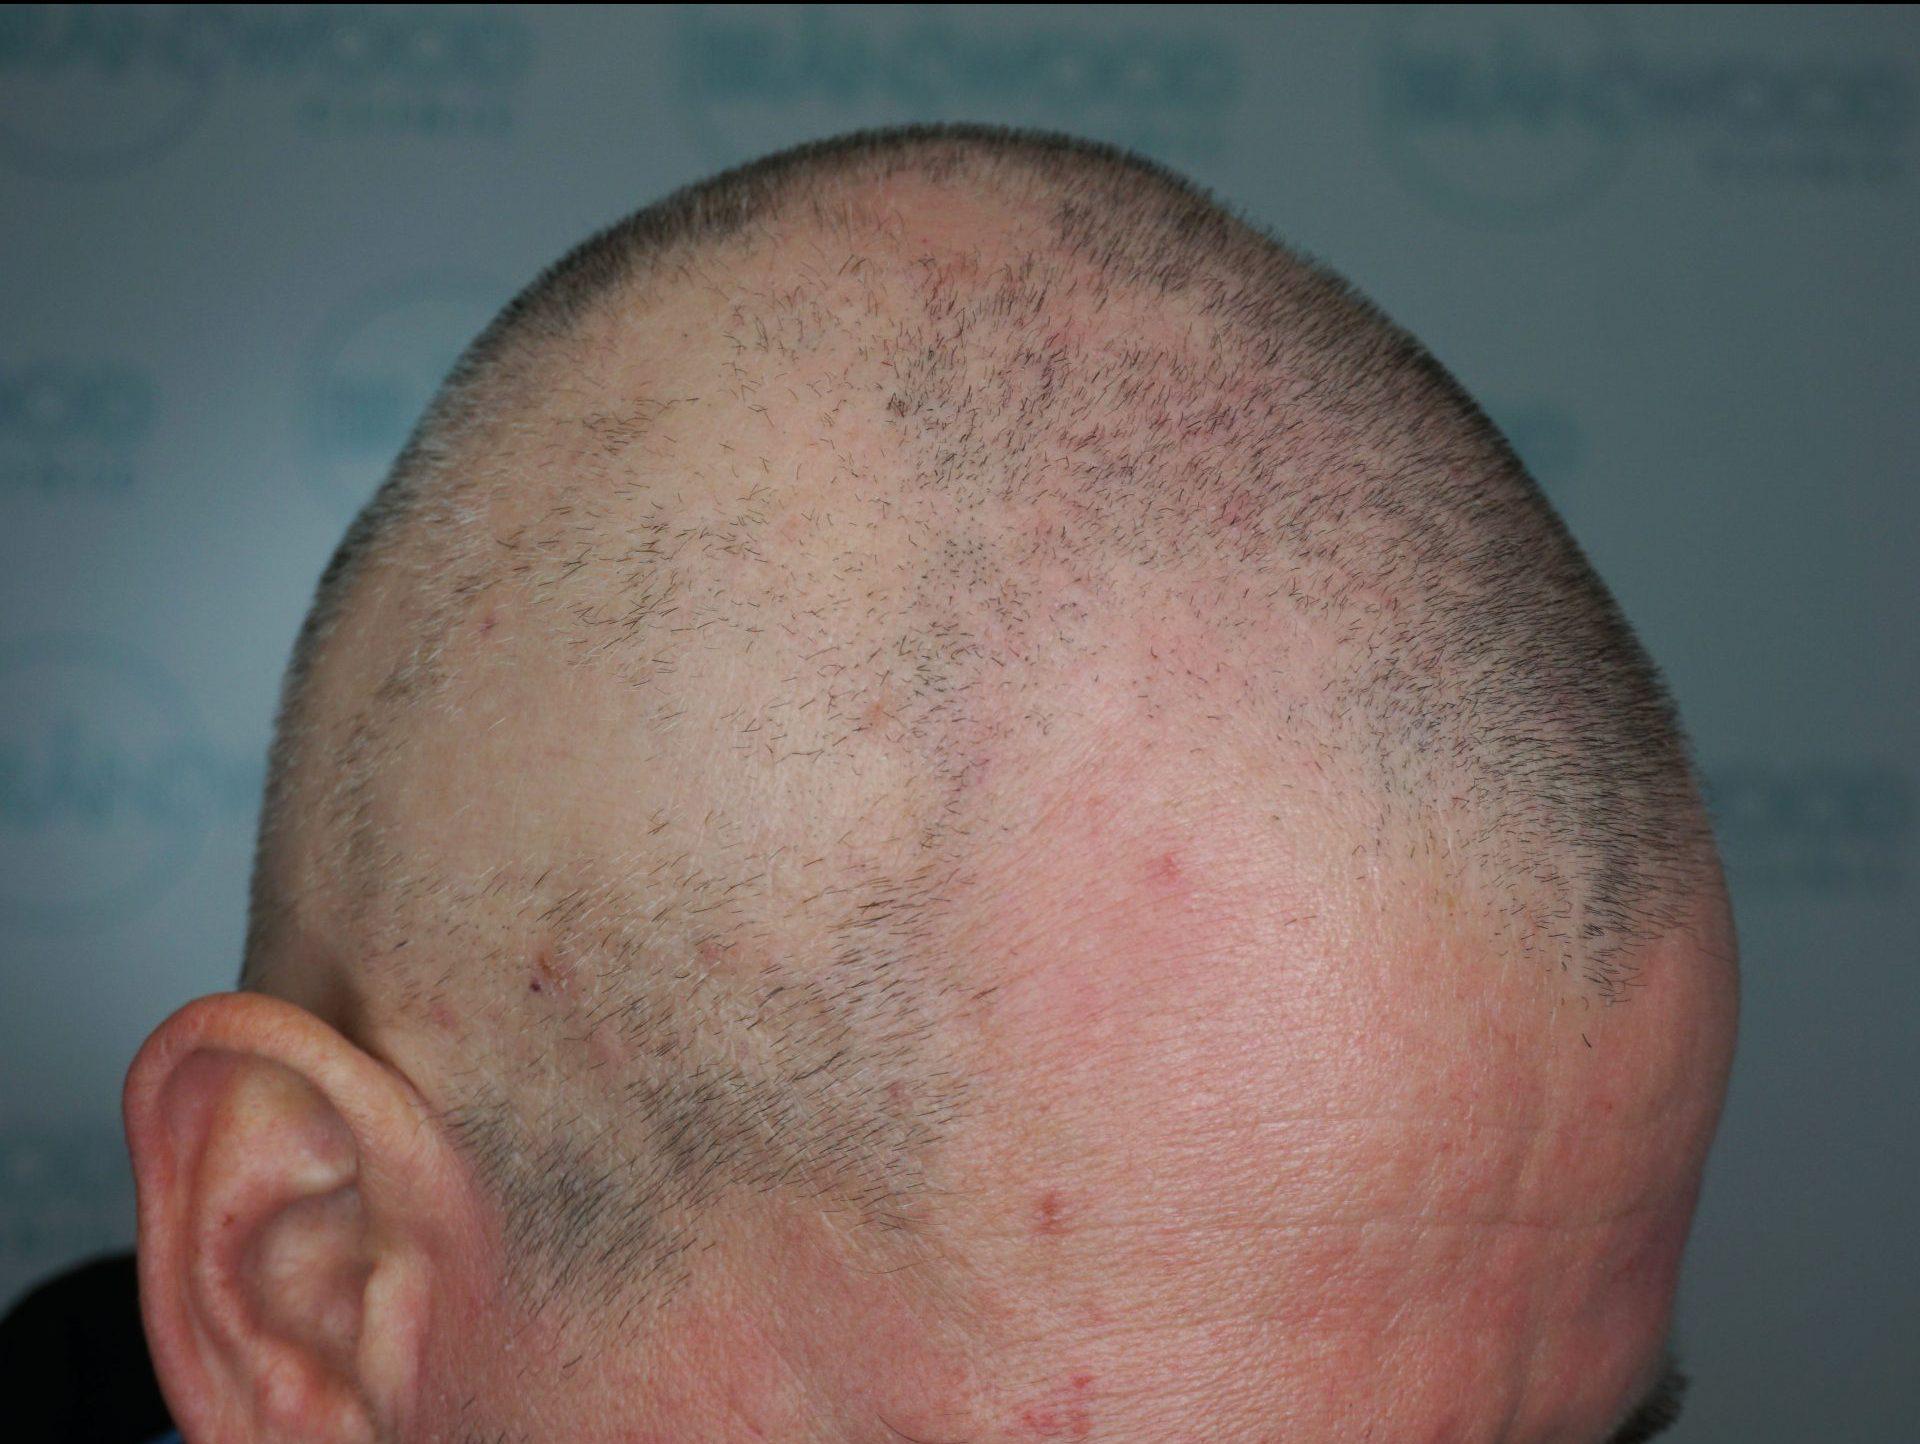 Alopecia: Before